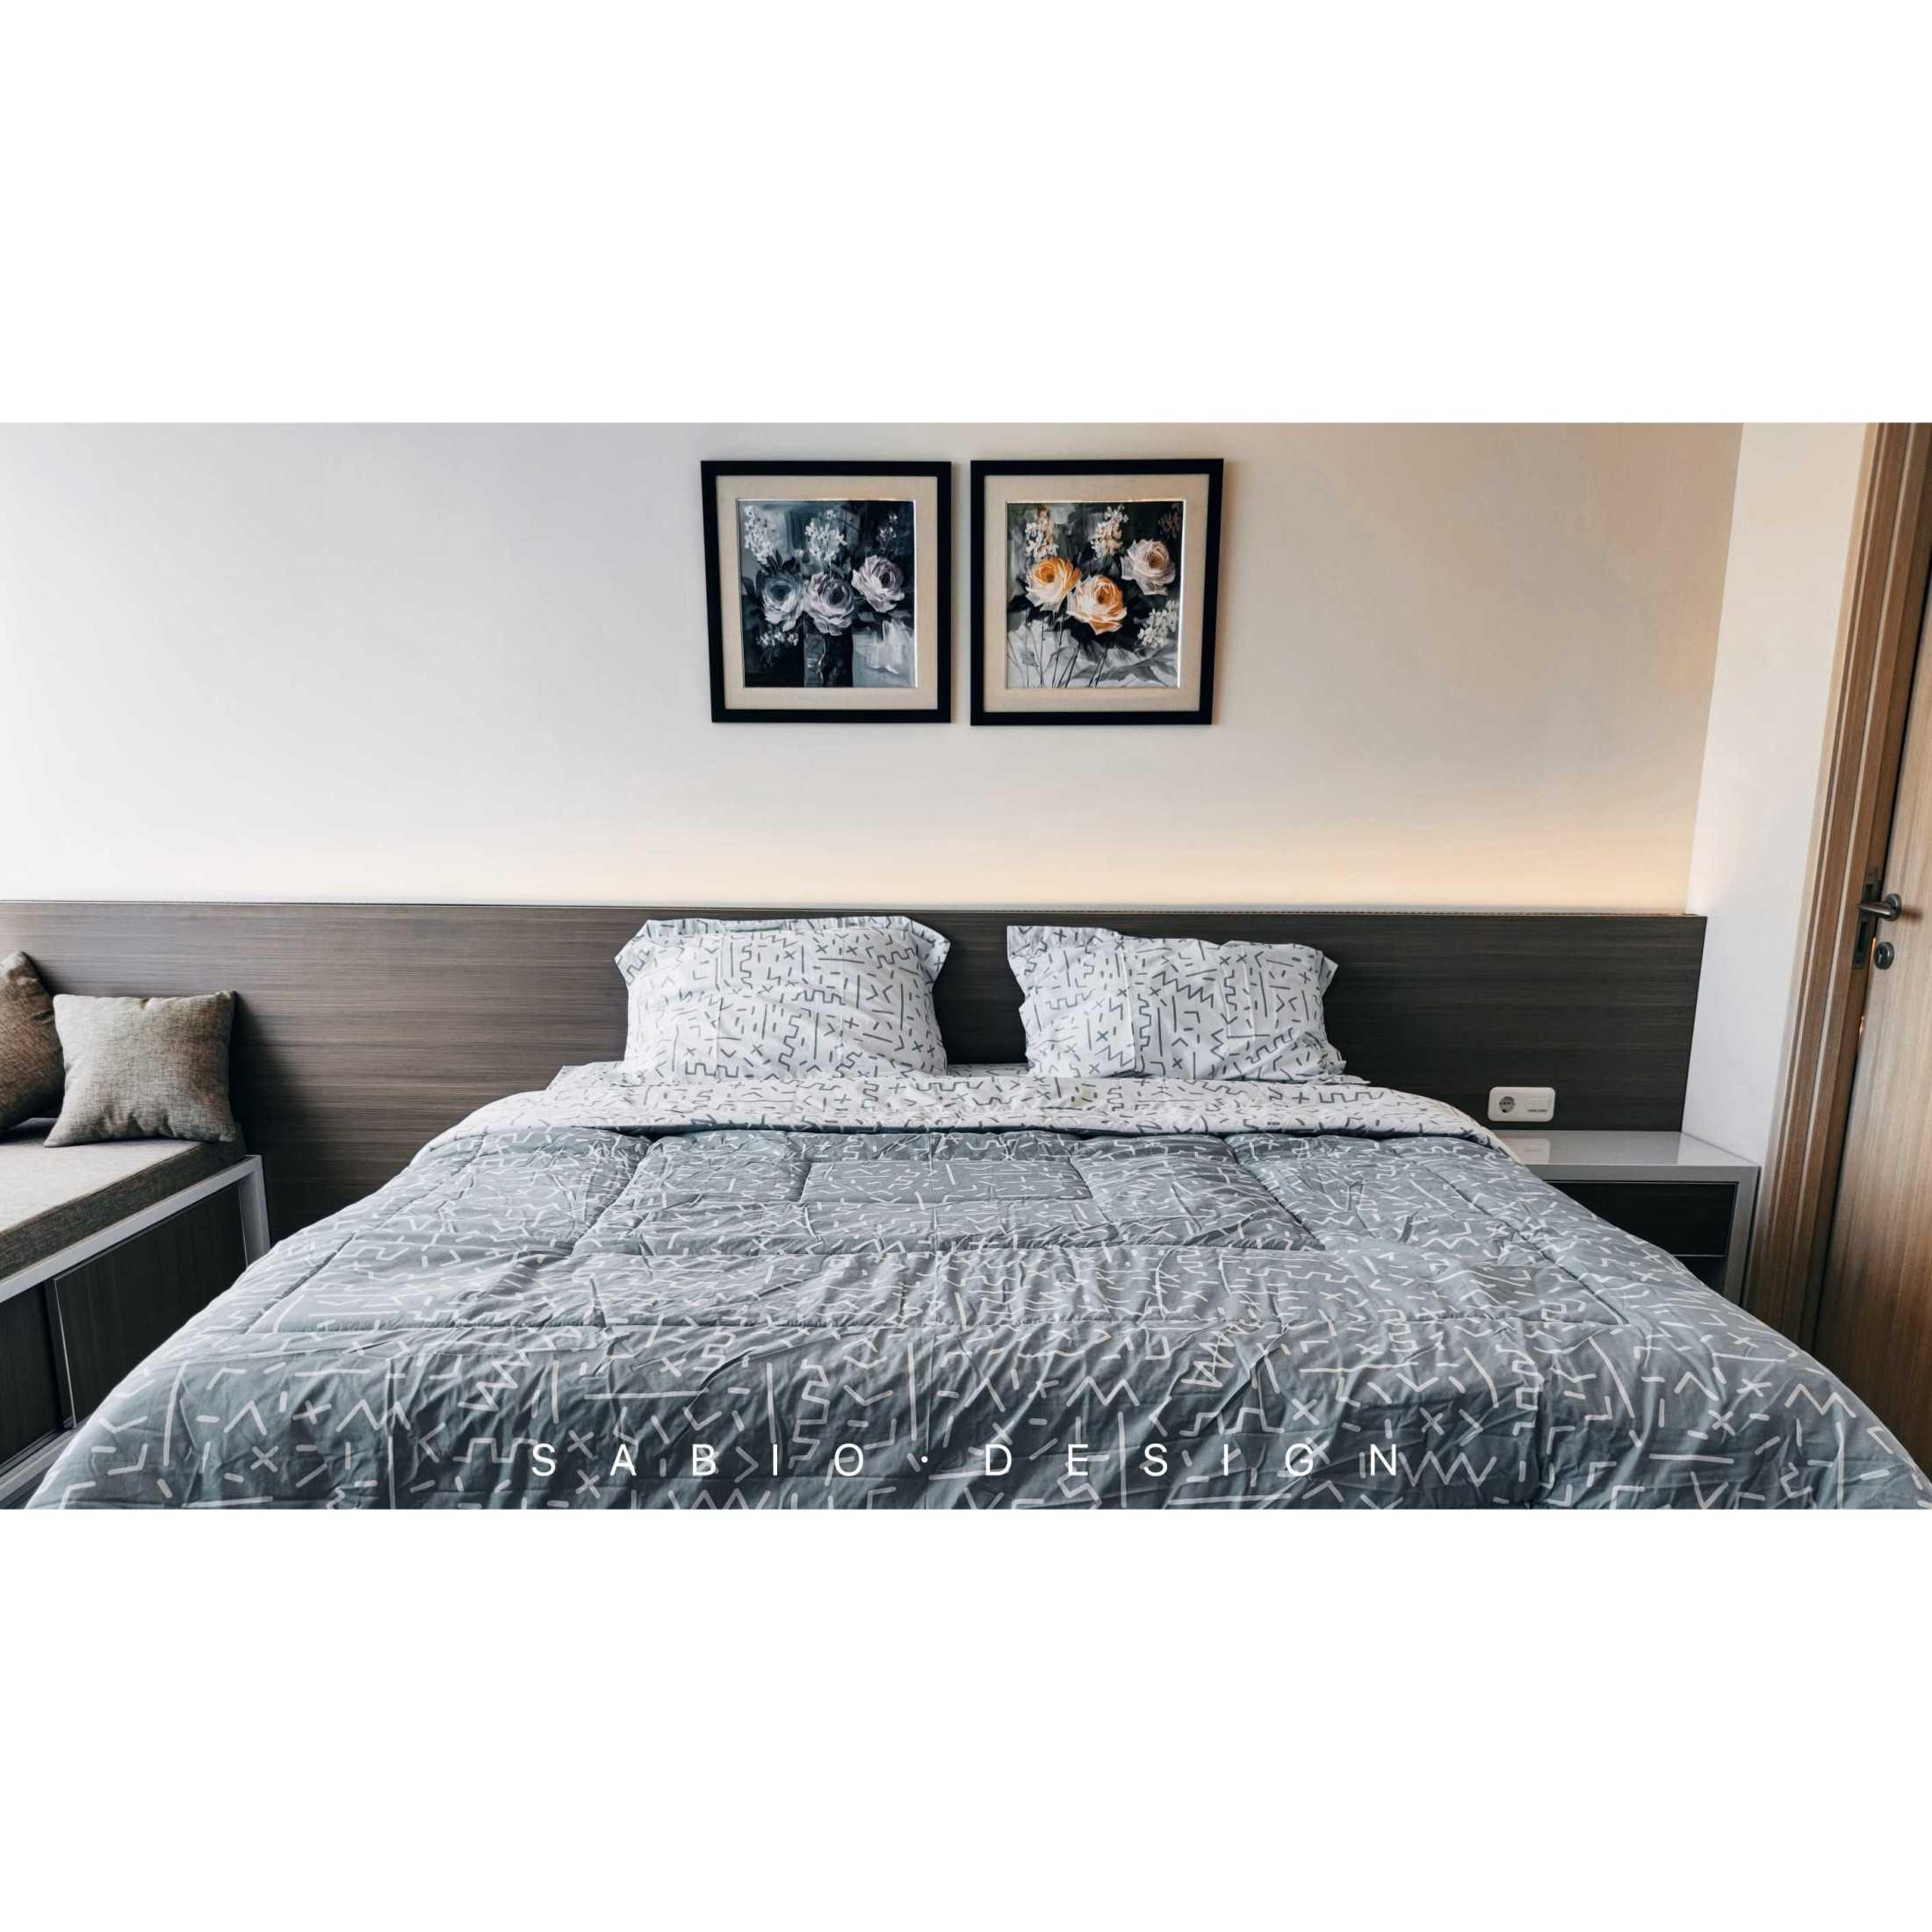 Sabio Design Interior Apartment Orange County Cibatu, Cikarang Sel., Bekasi, Jawa Barat 17530, Indonesia Cibatu, Cikarang Sel., Bekasi, Jawa Barat 17530, Indonesia Sabio-Design-Interior-Apartment-Orange-County  119921